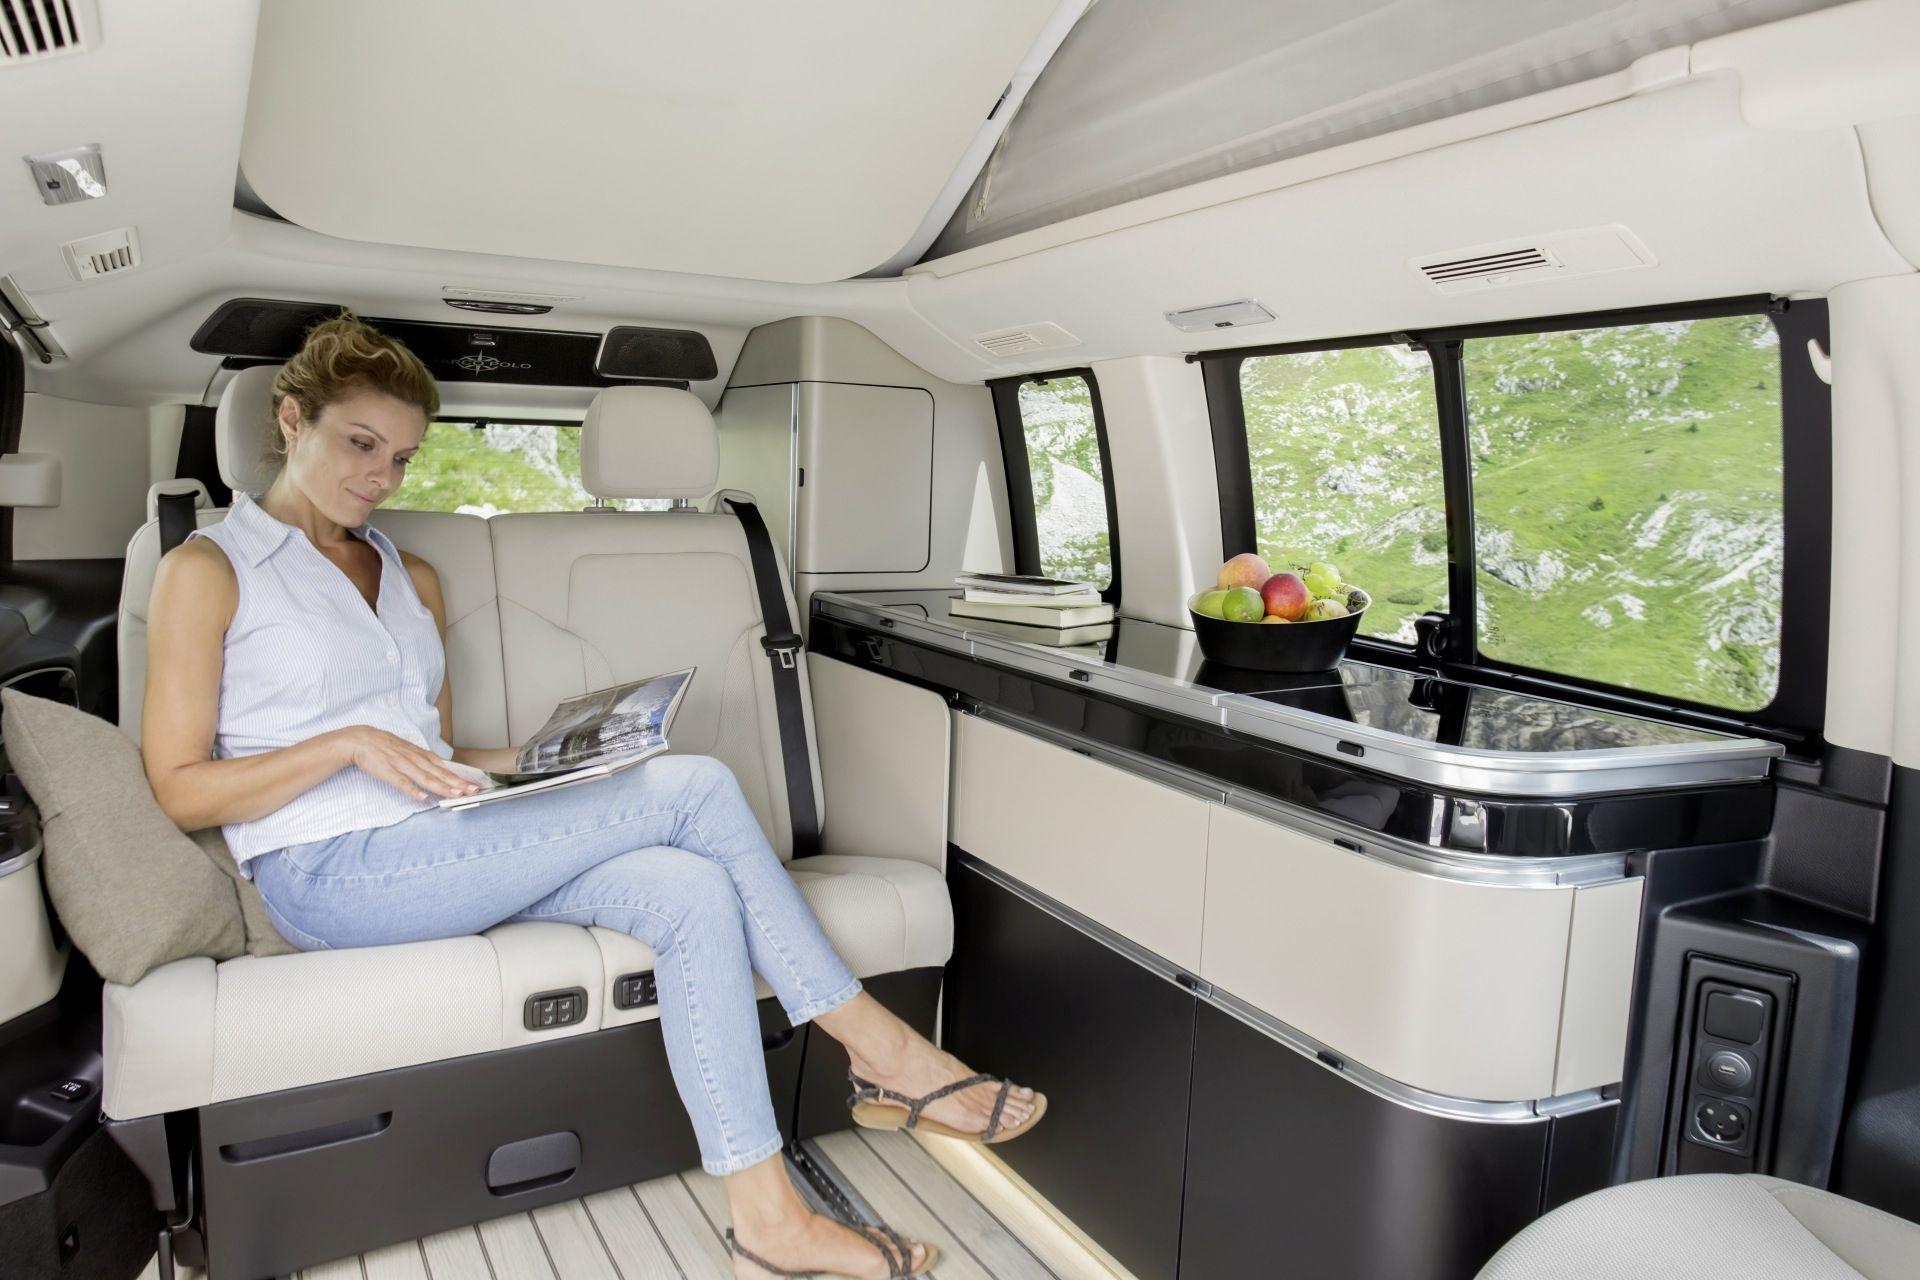 Mercedes Marco Polo Compact Camper Vans 397648 Jpg 1 920